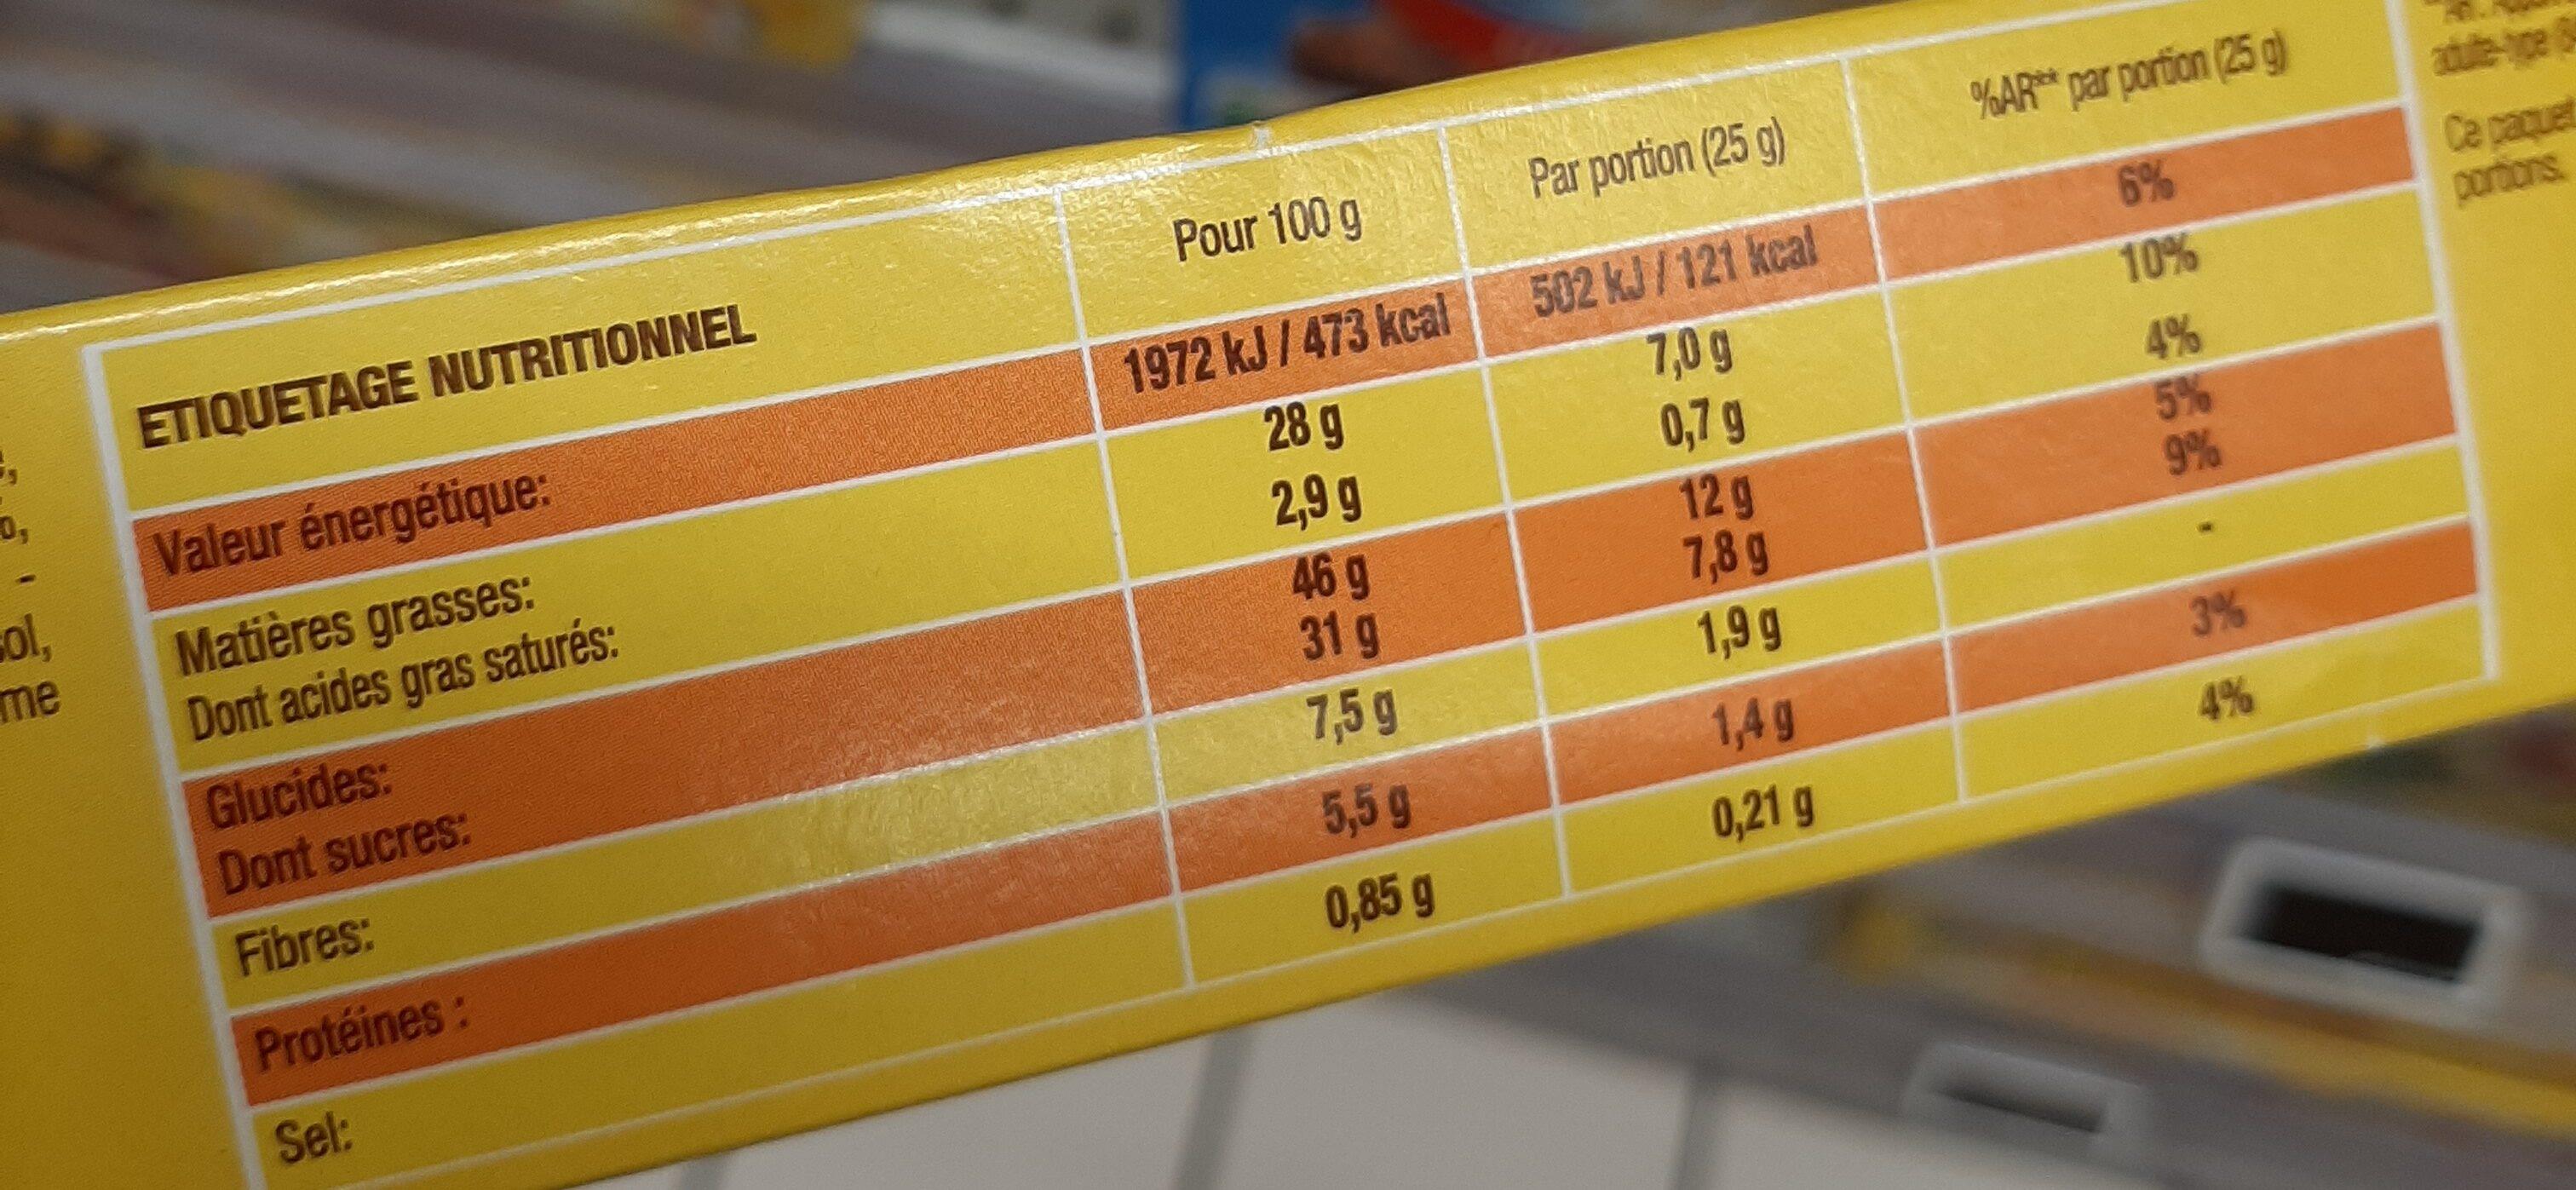 Savane pocket x7 cacao-noisette 175g - Informations nutritionnelles - fr